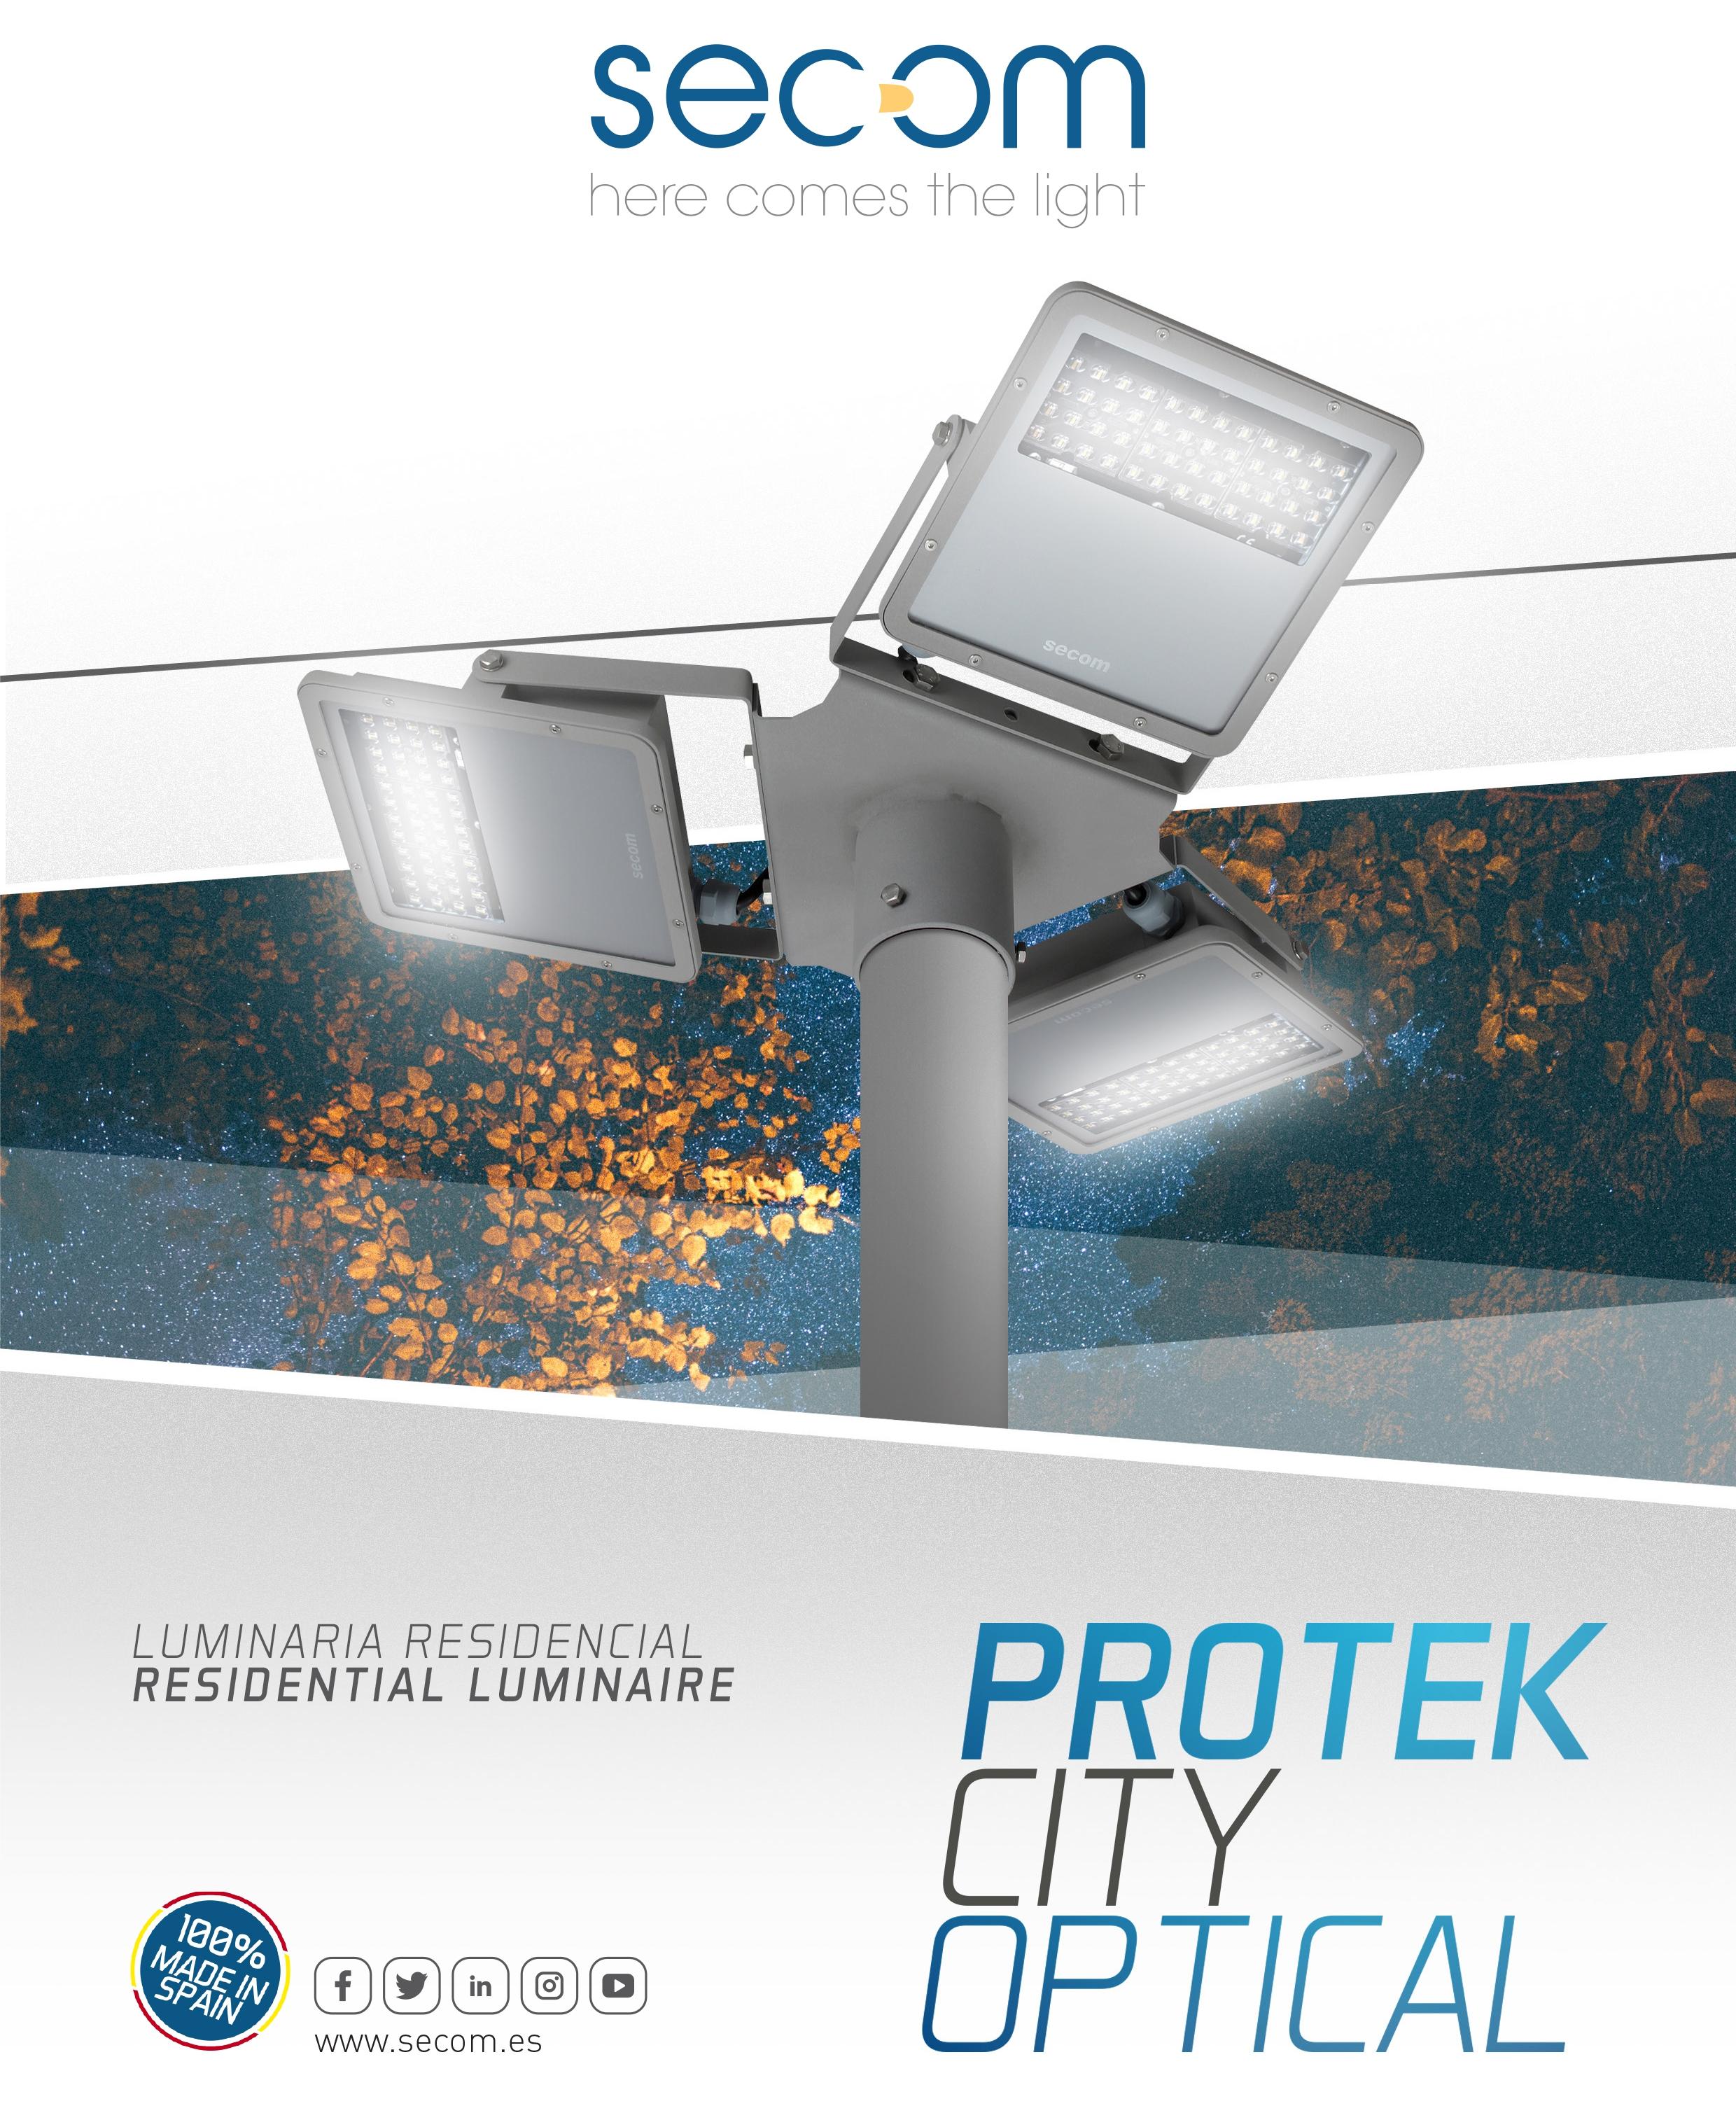 Nueva linea de luminarias residenciales Protek City Optical de Secom Iluminació